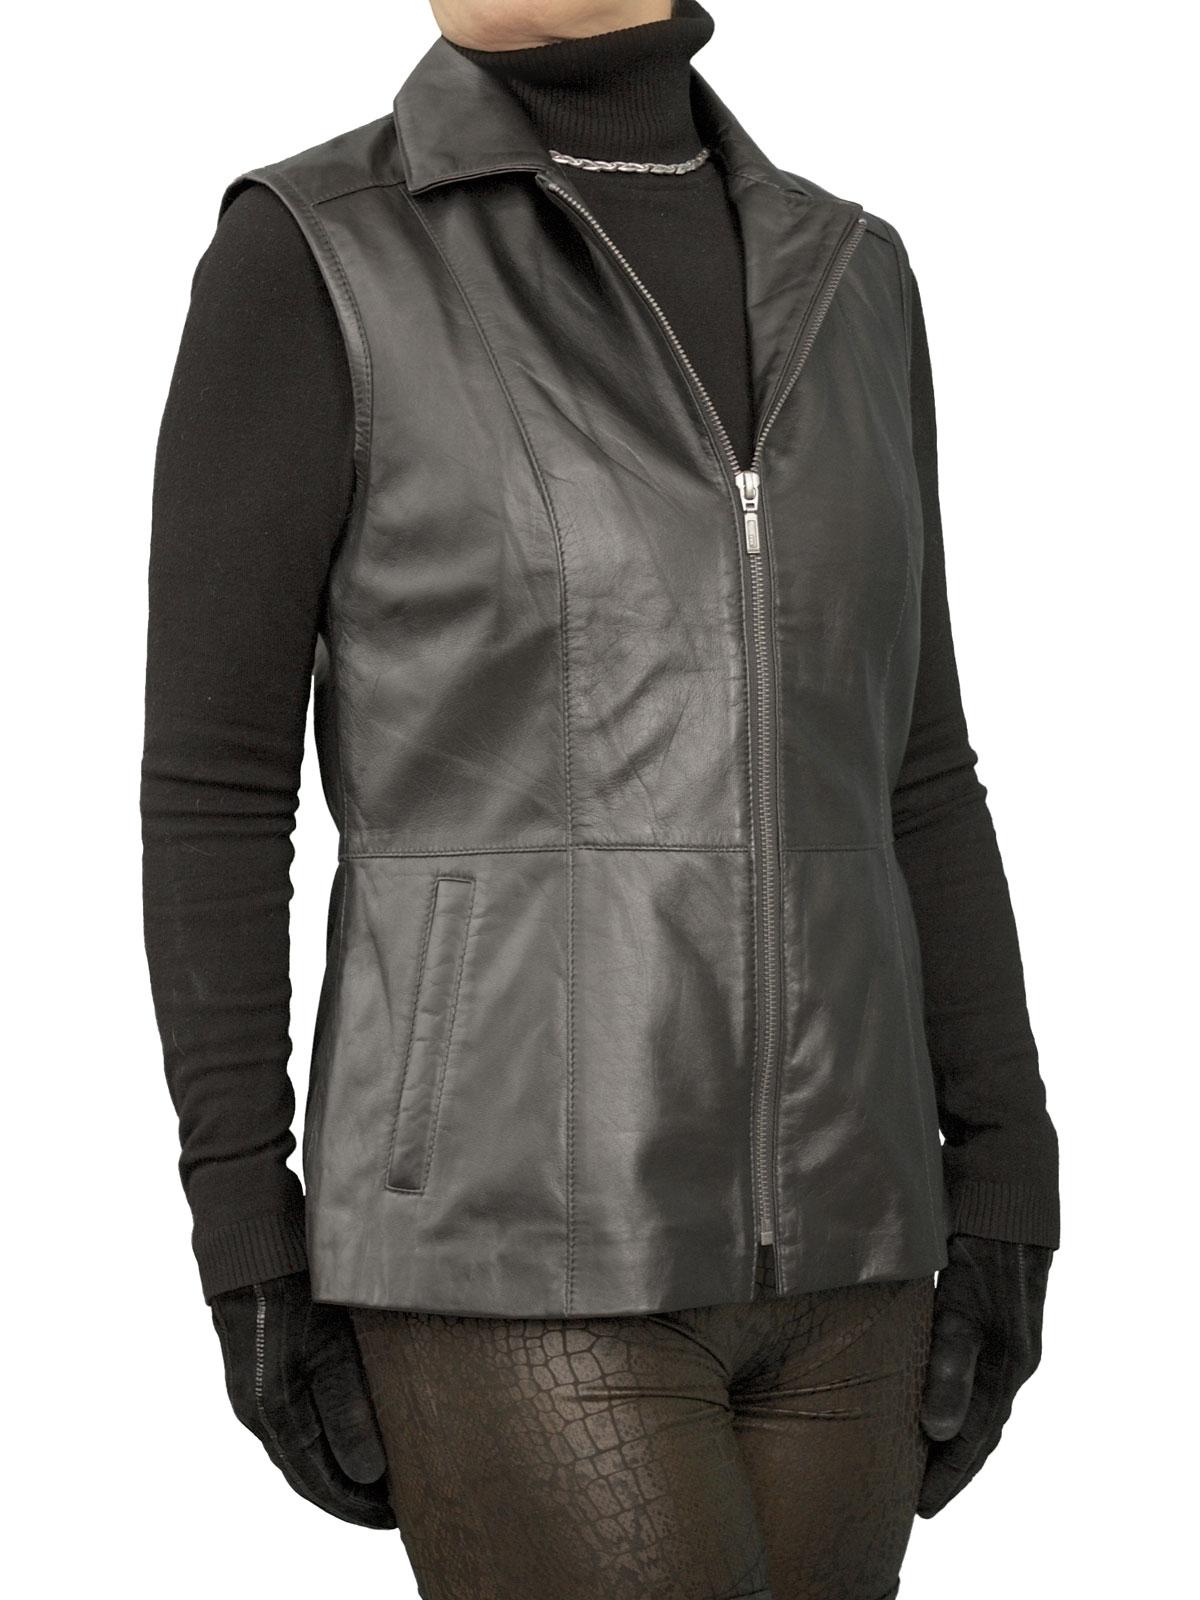 Womens Leather Gilet Waistcoat, black, standard collar ...